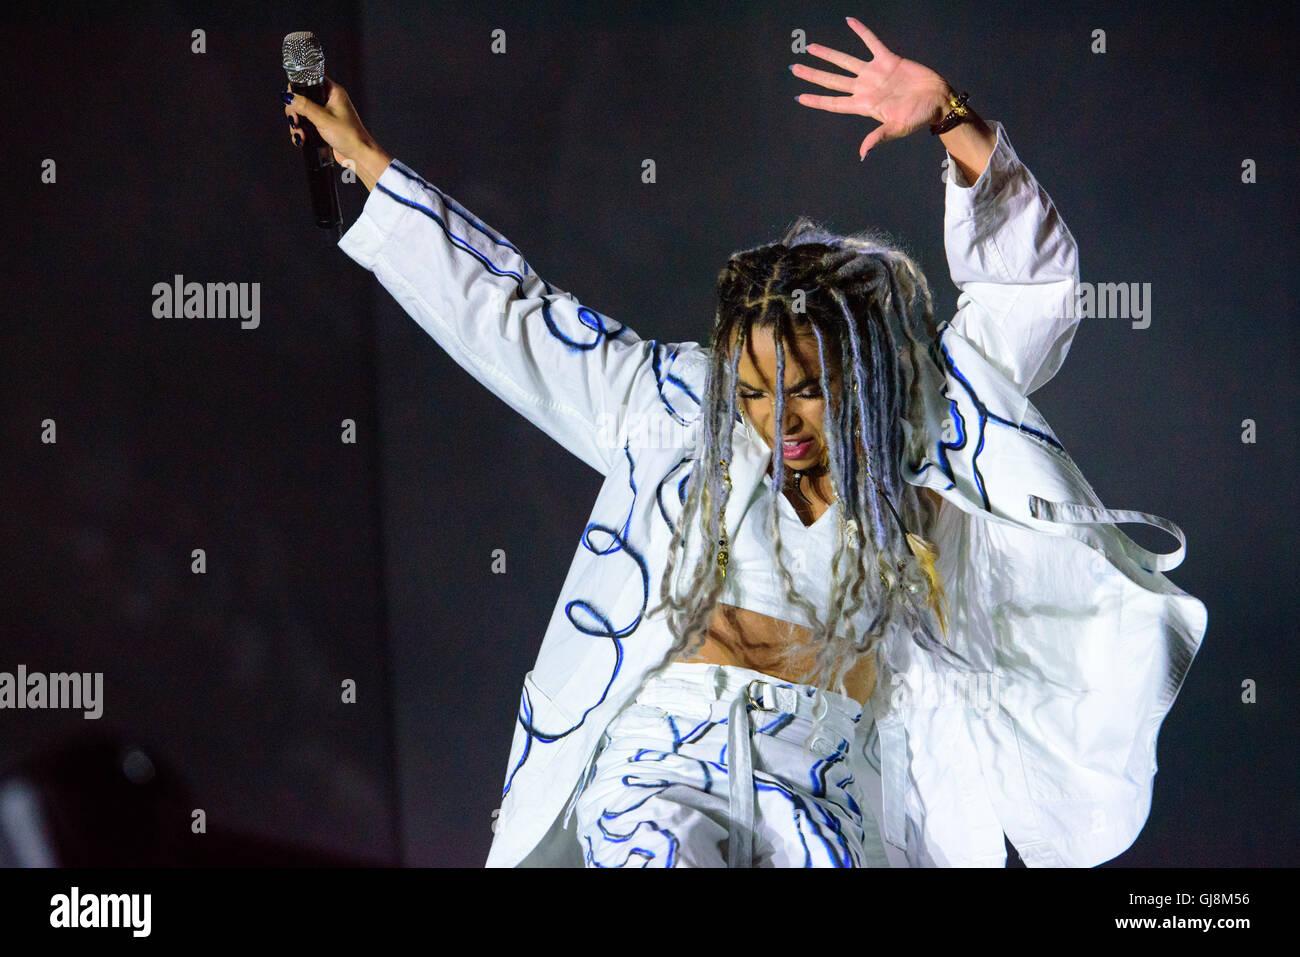 Helsinki, Finland. August 13th, 2016. FKA Twigs performing at Flow Festival, Helsinki, Finland. Now in it's - Stock Image